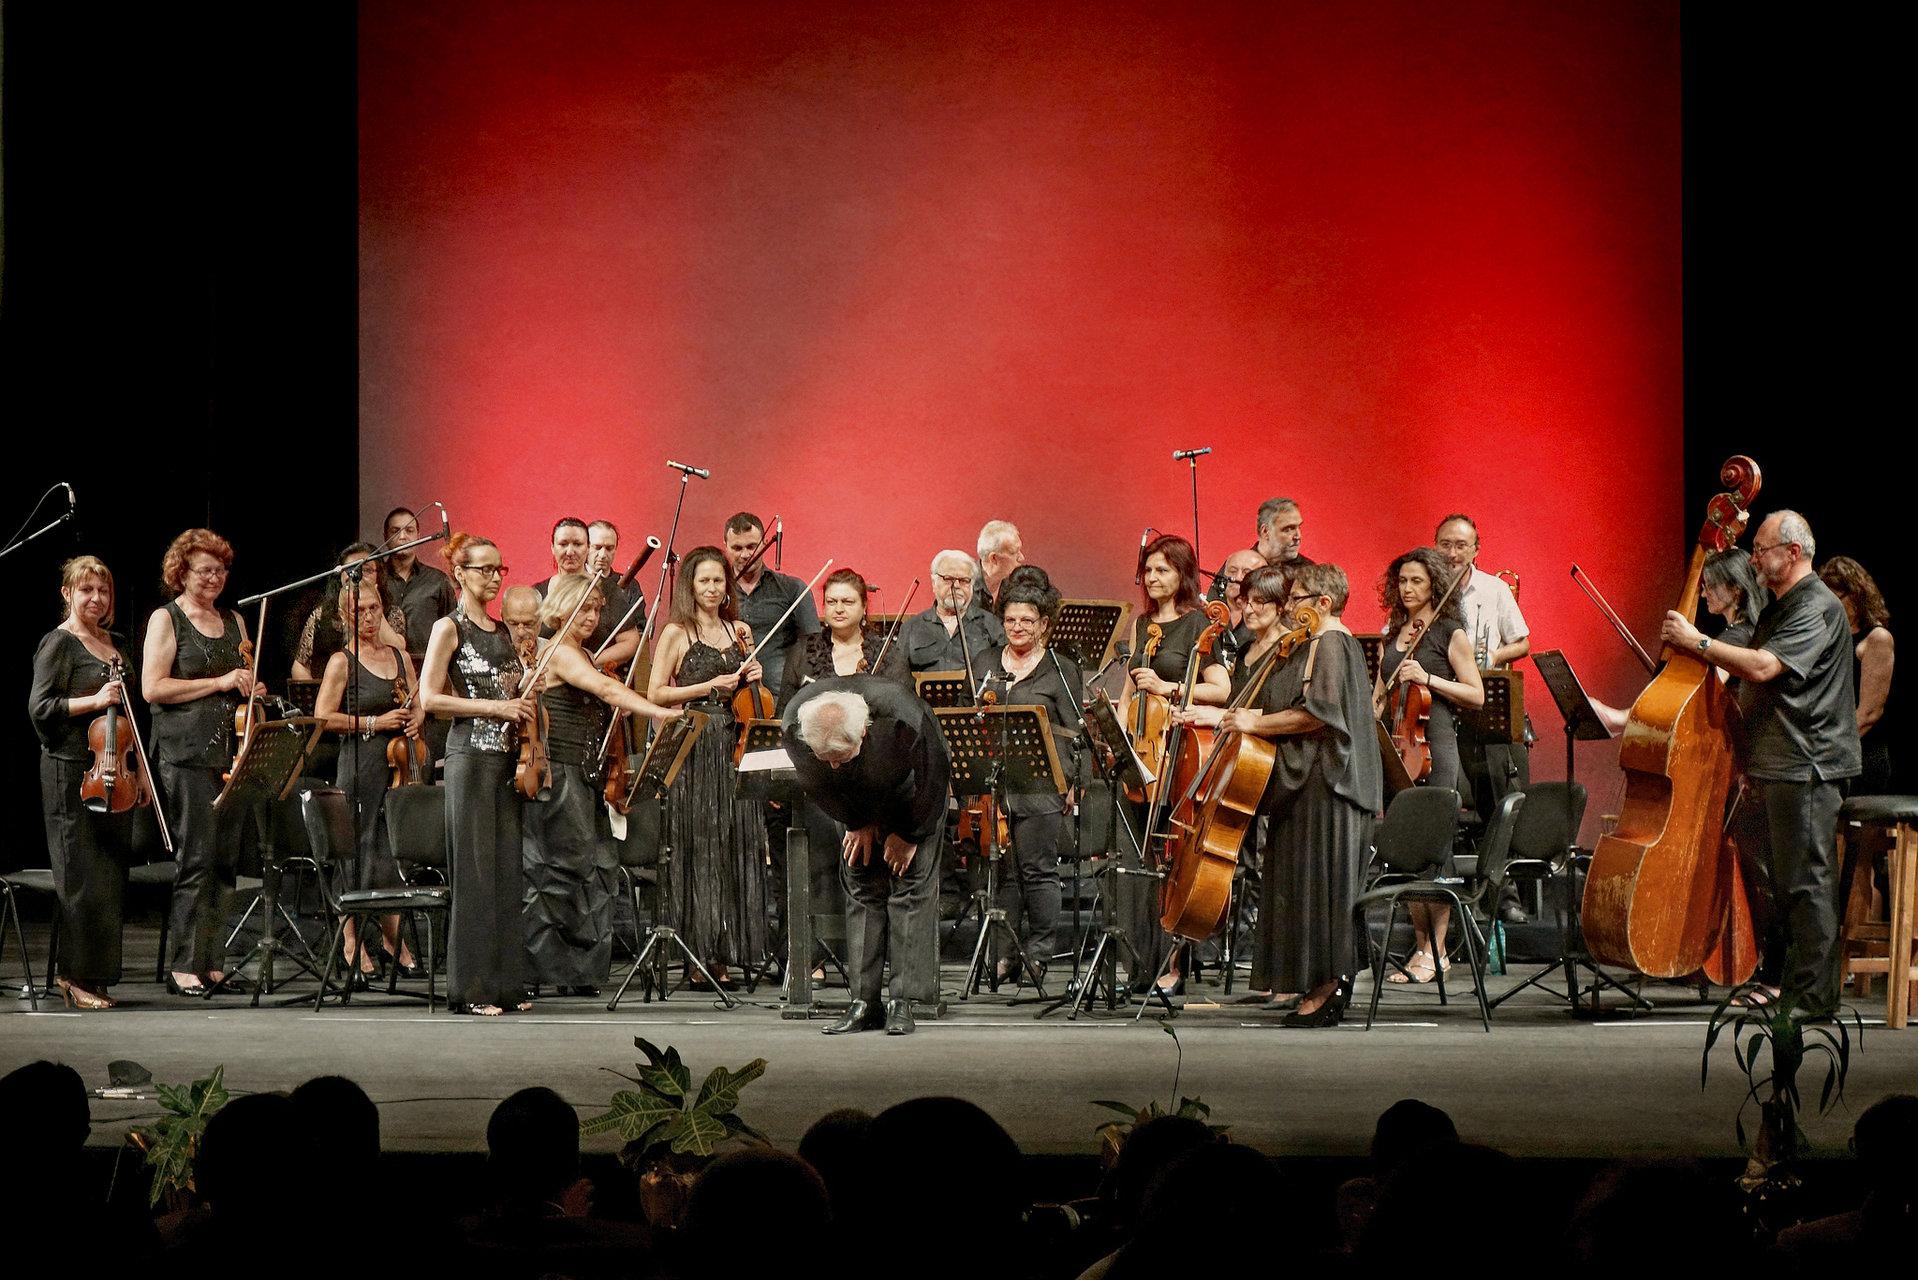 Photo in On stage | Author Цветан Тодоров - plynii | PHOTO FORUM